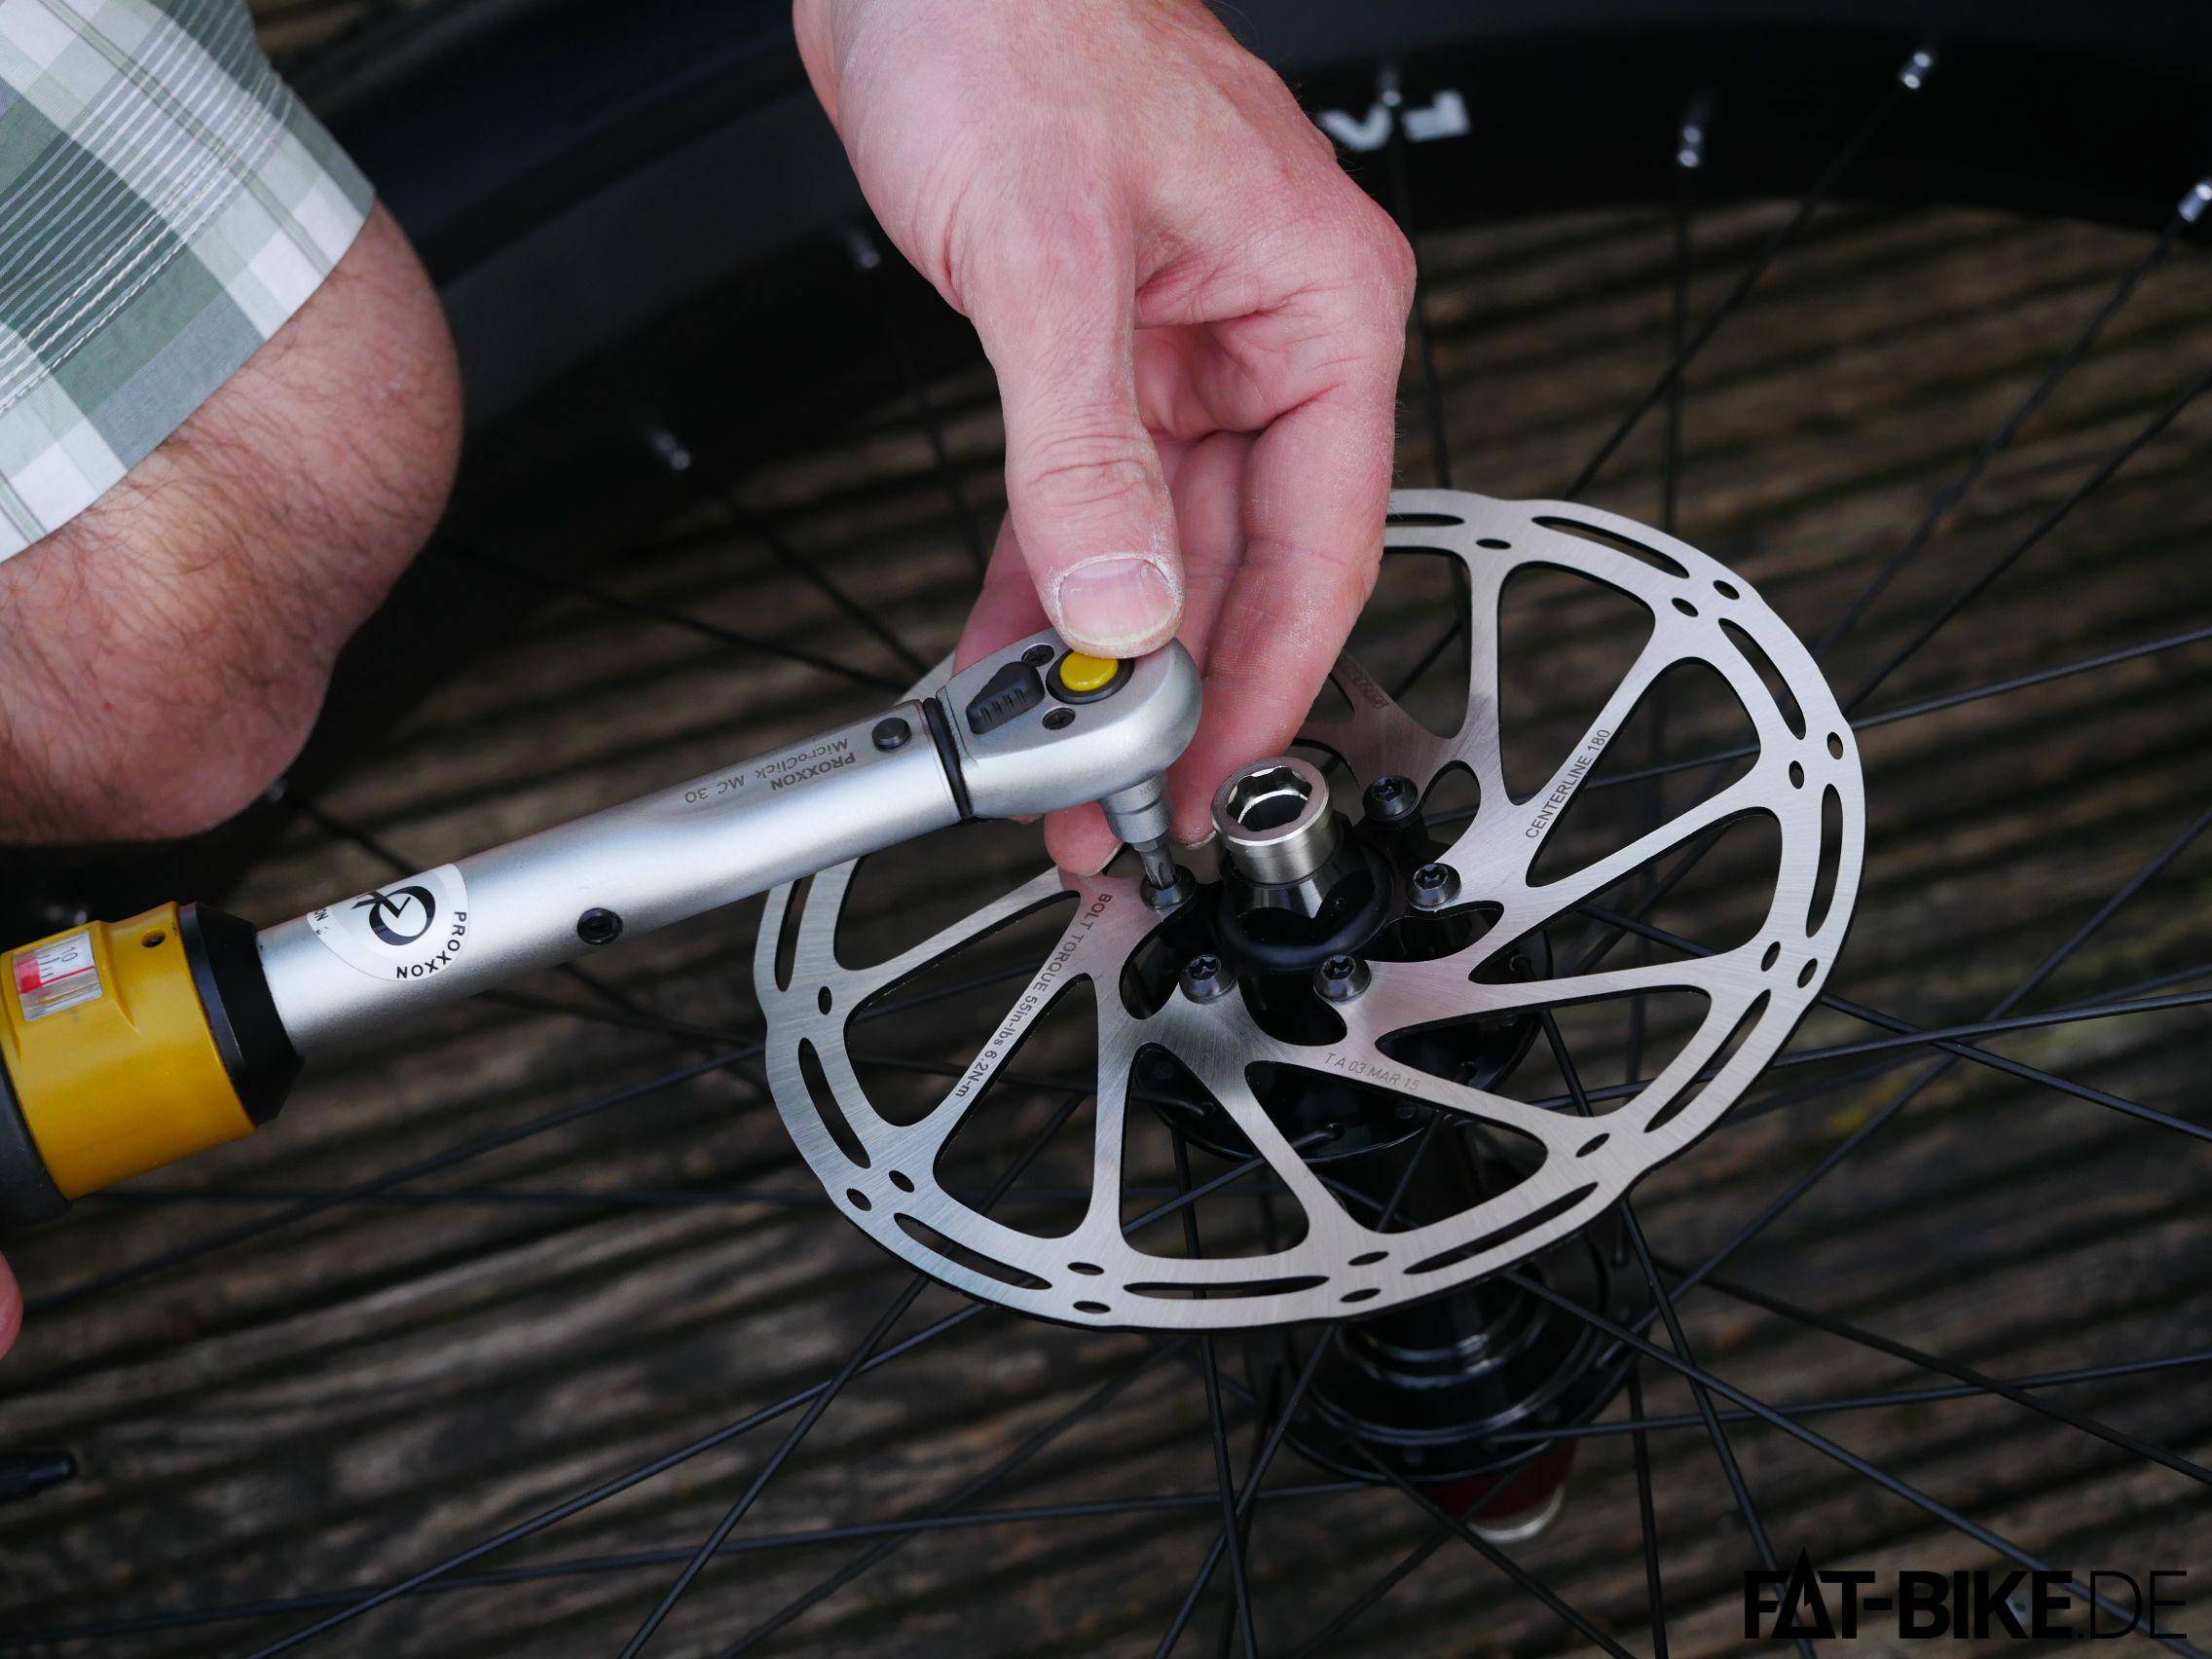 3 Bremsscheibe montieren Drehmoment